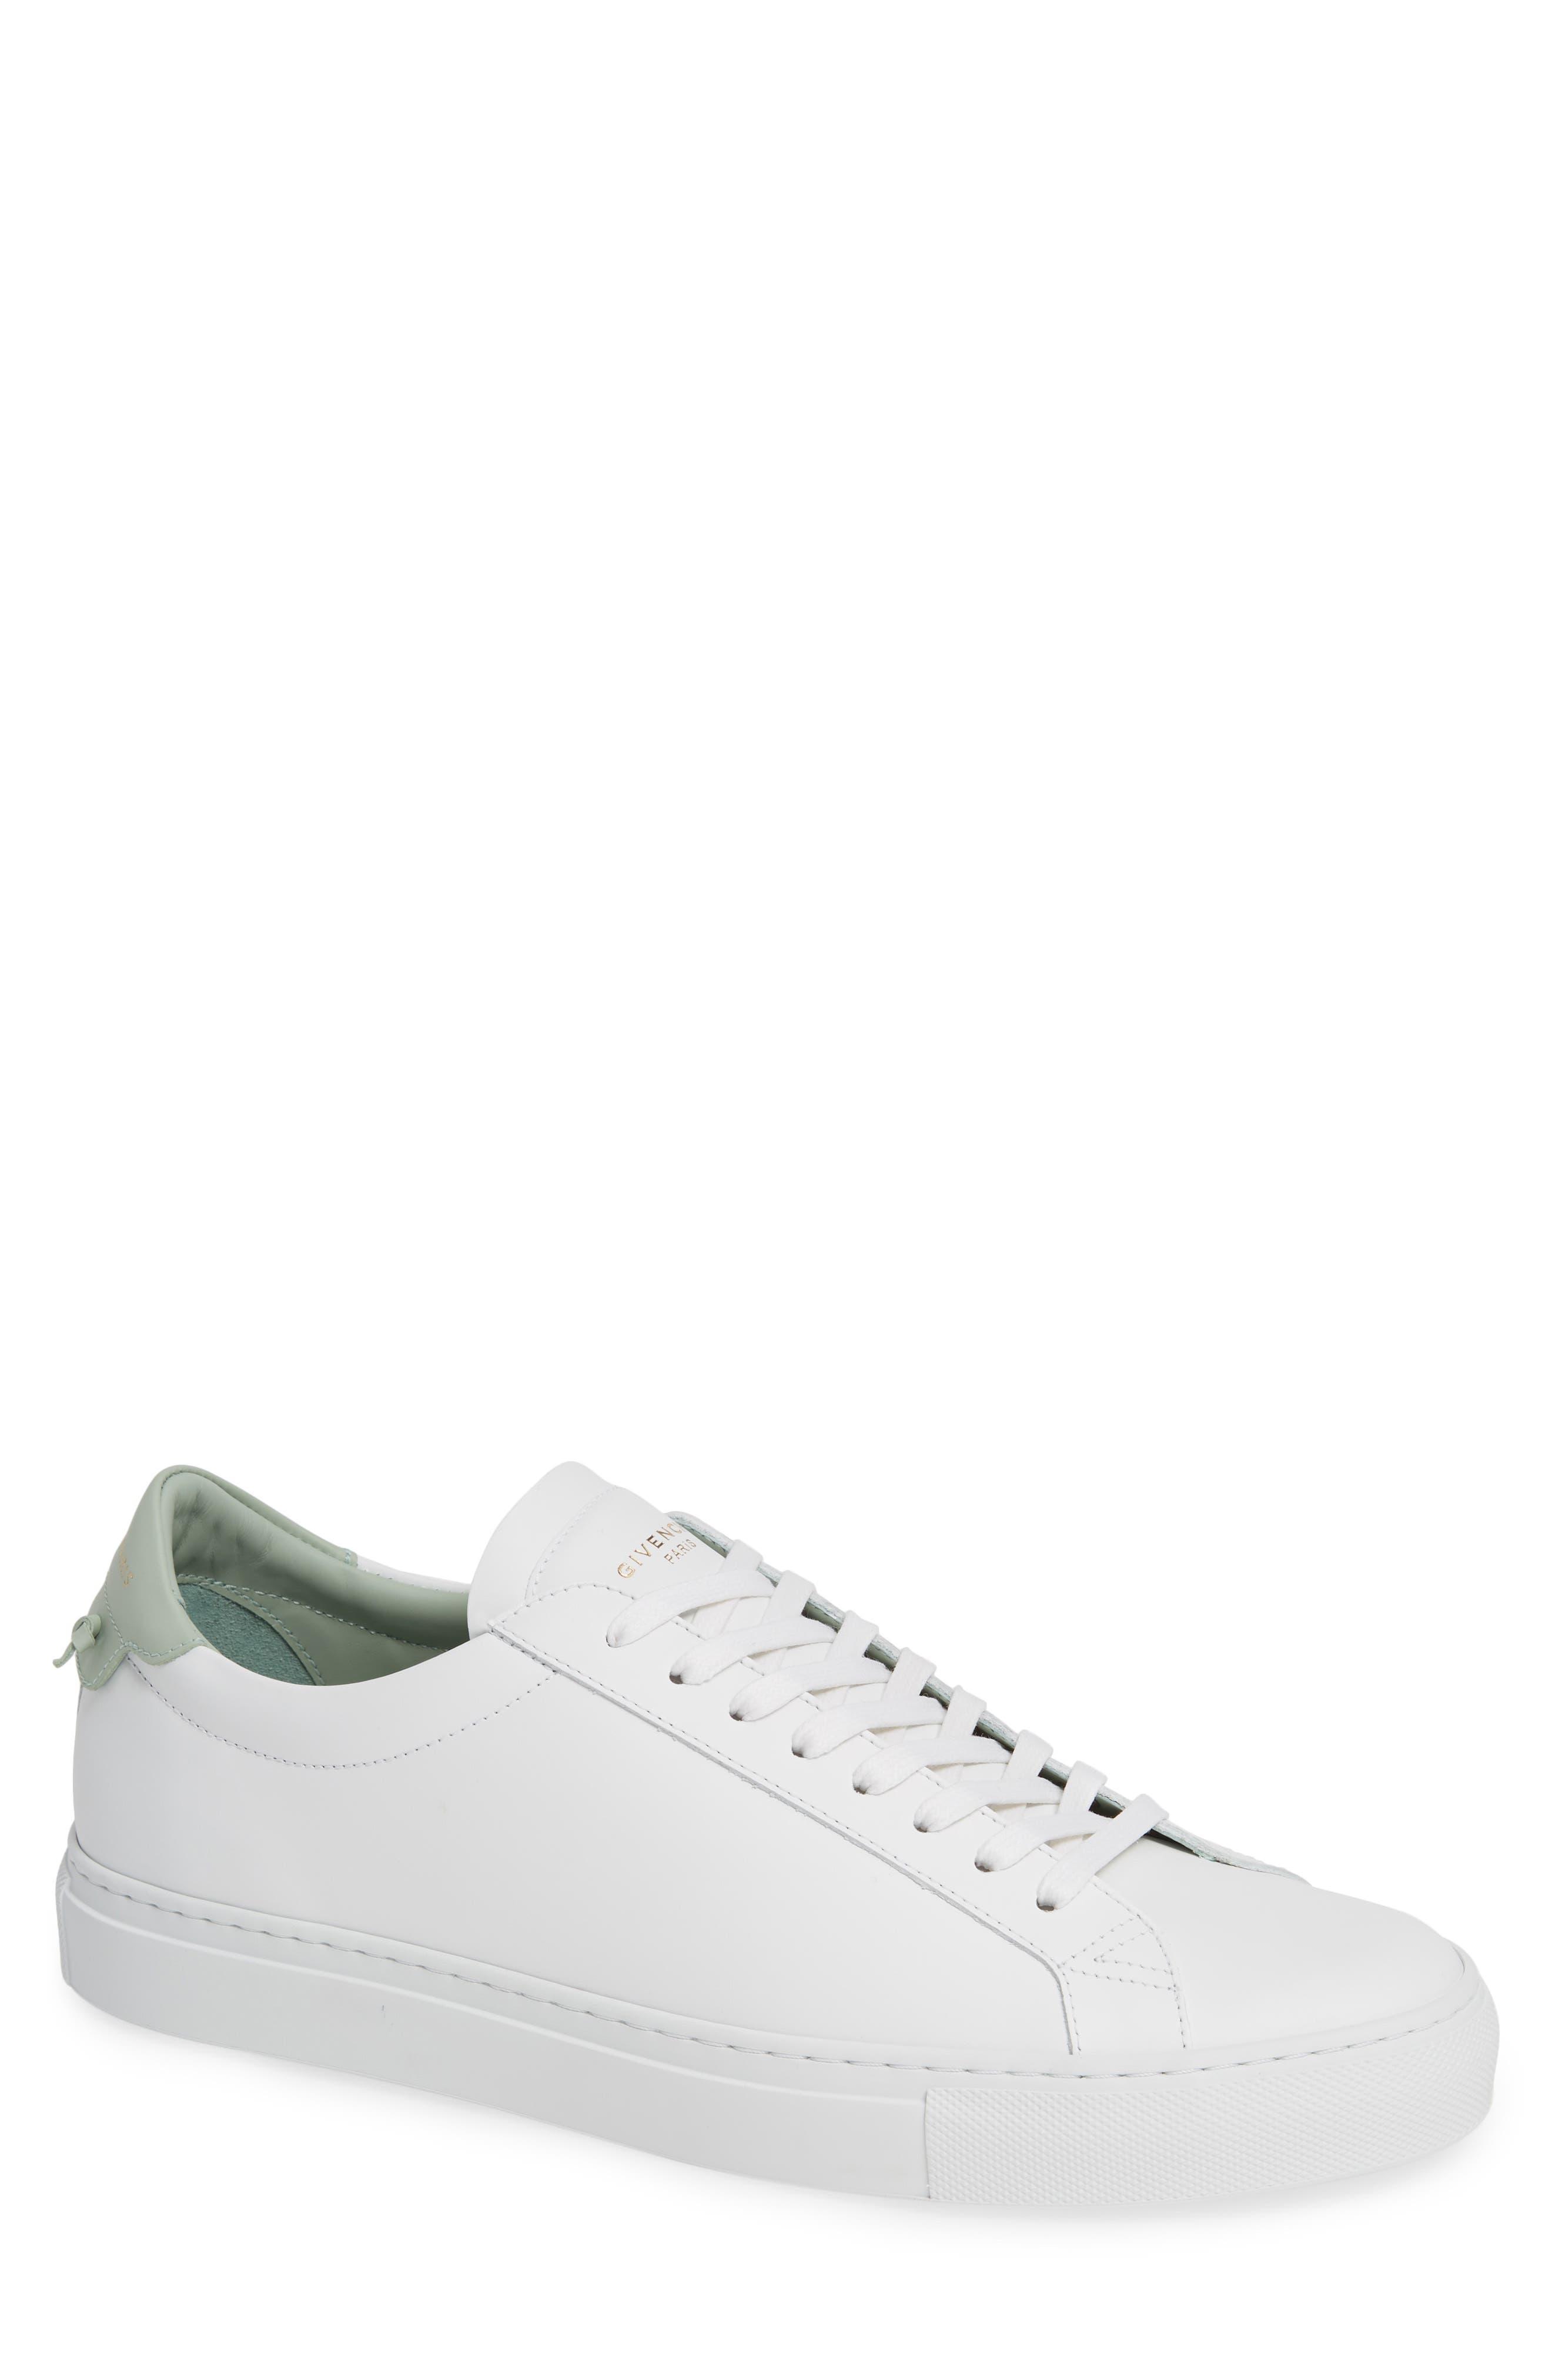 'Urban Knots Lo' Sneaker,                             Main thumbnail 1, color,                             WHITE/ GREEN